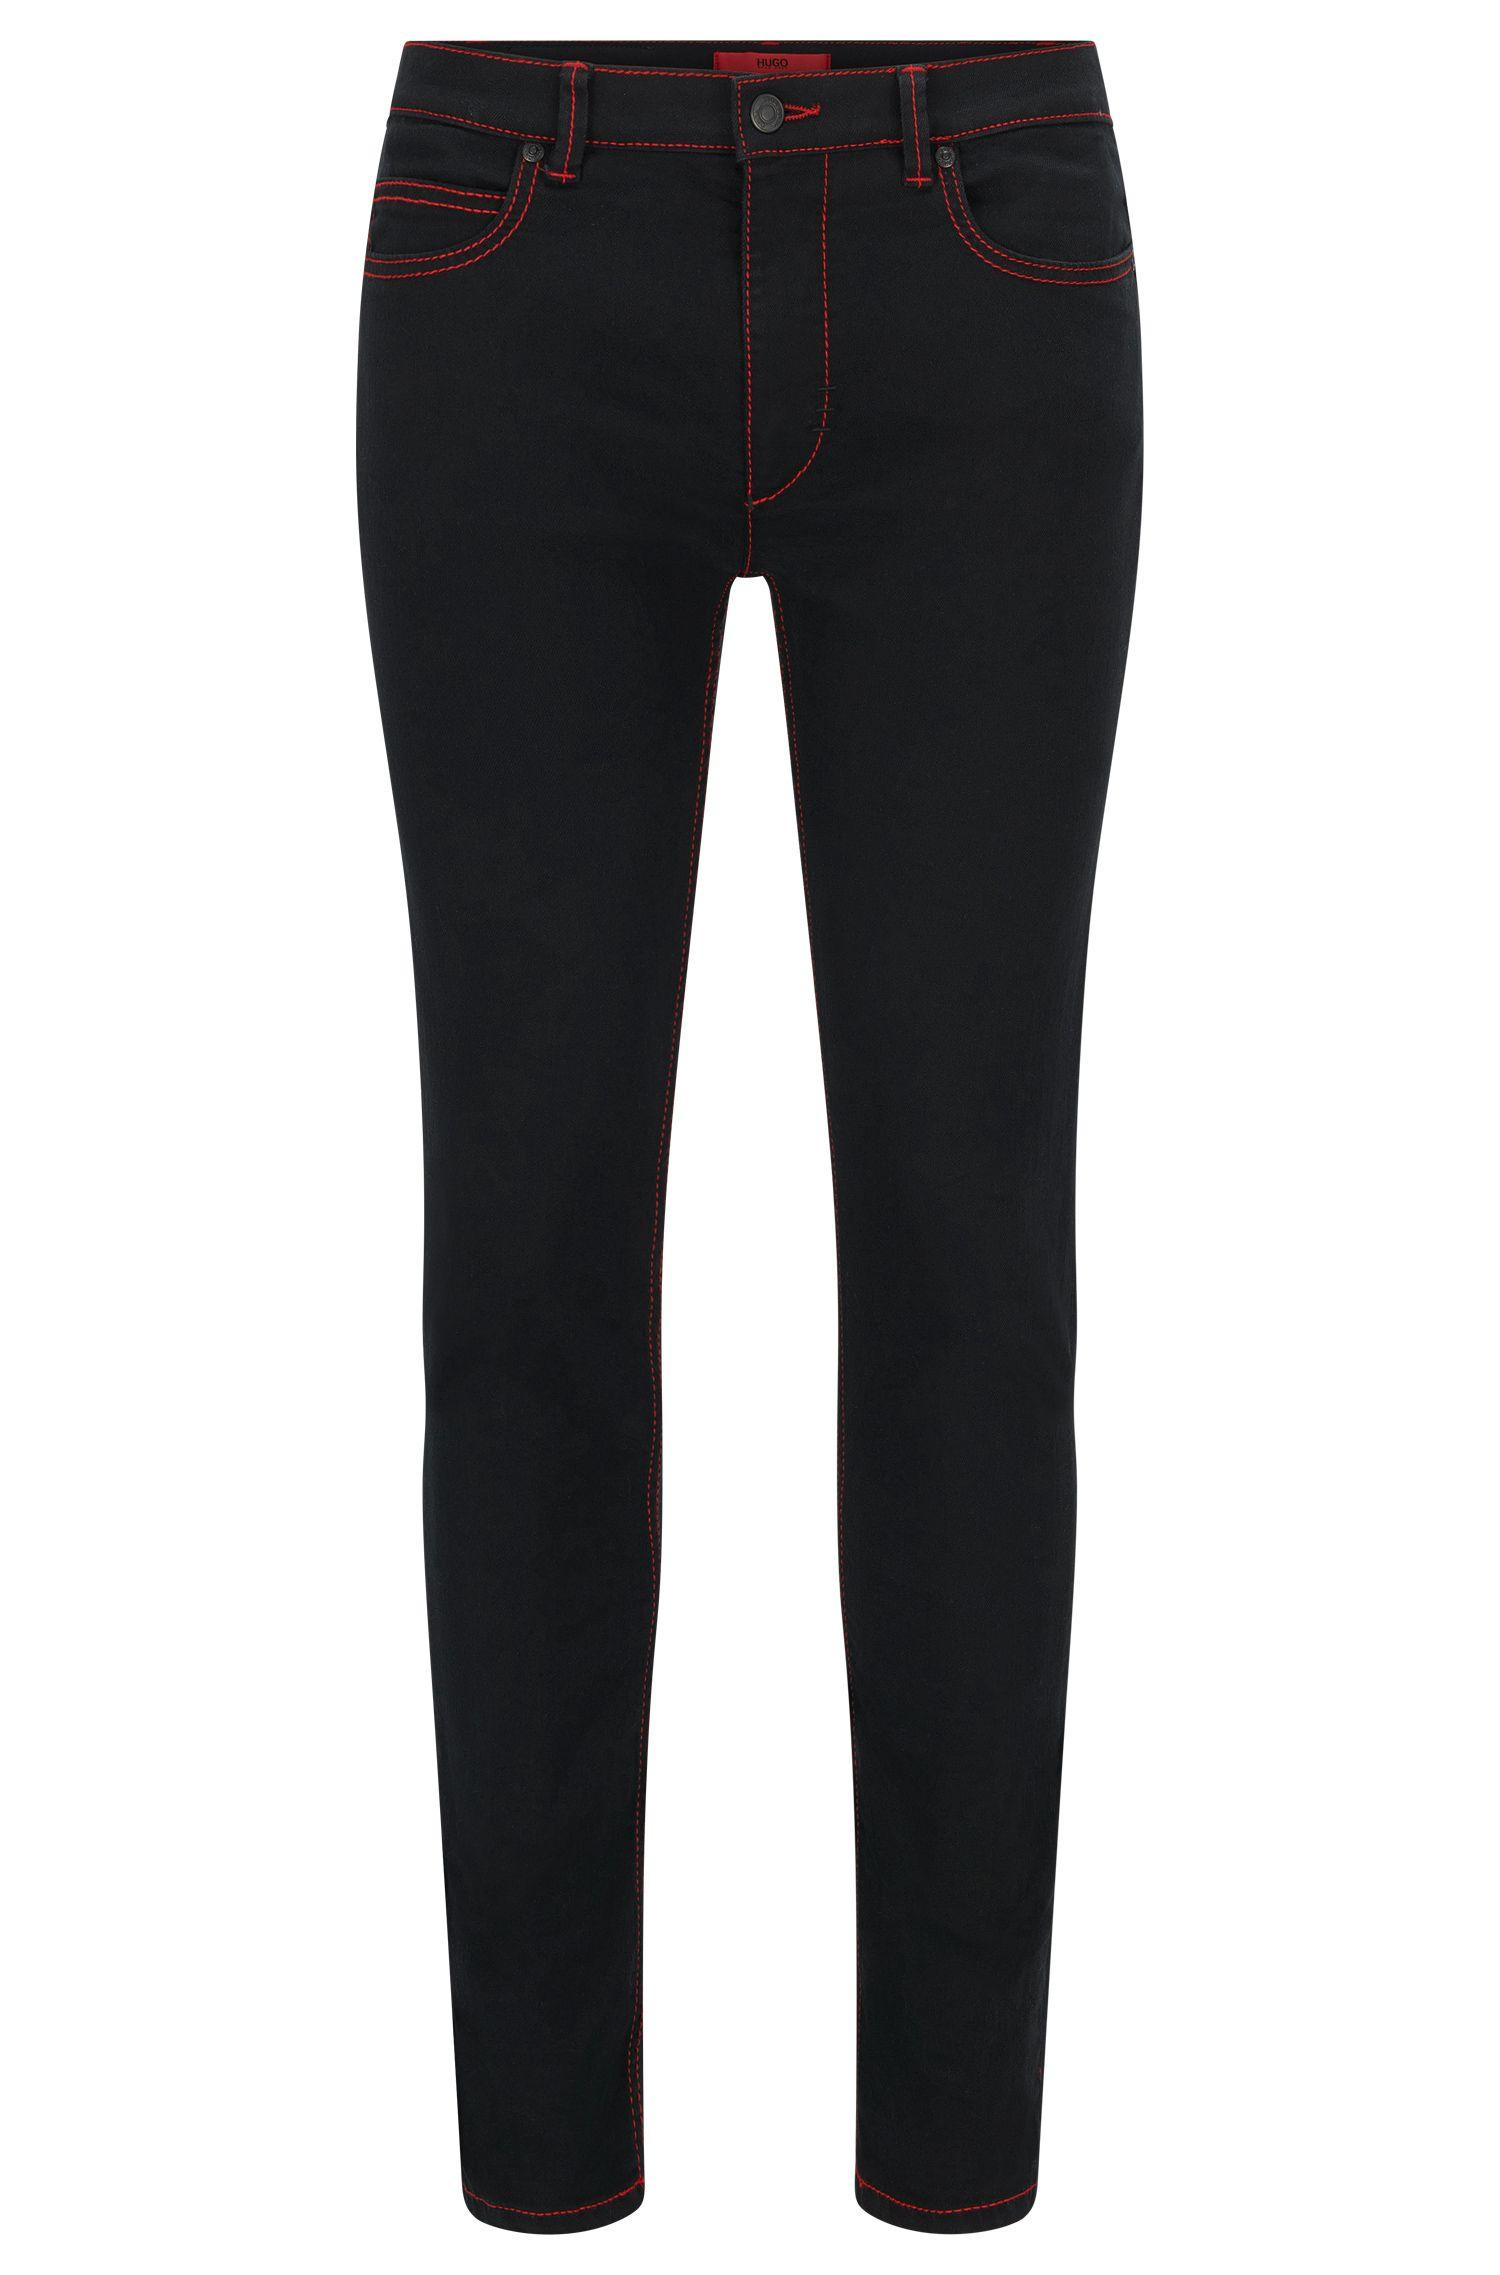 10 oz Stretch Cotton Jeans, Skinny Fit | Hugo 734